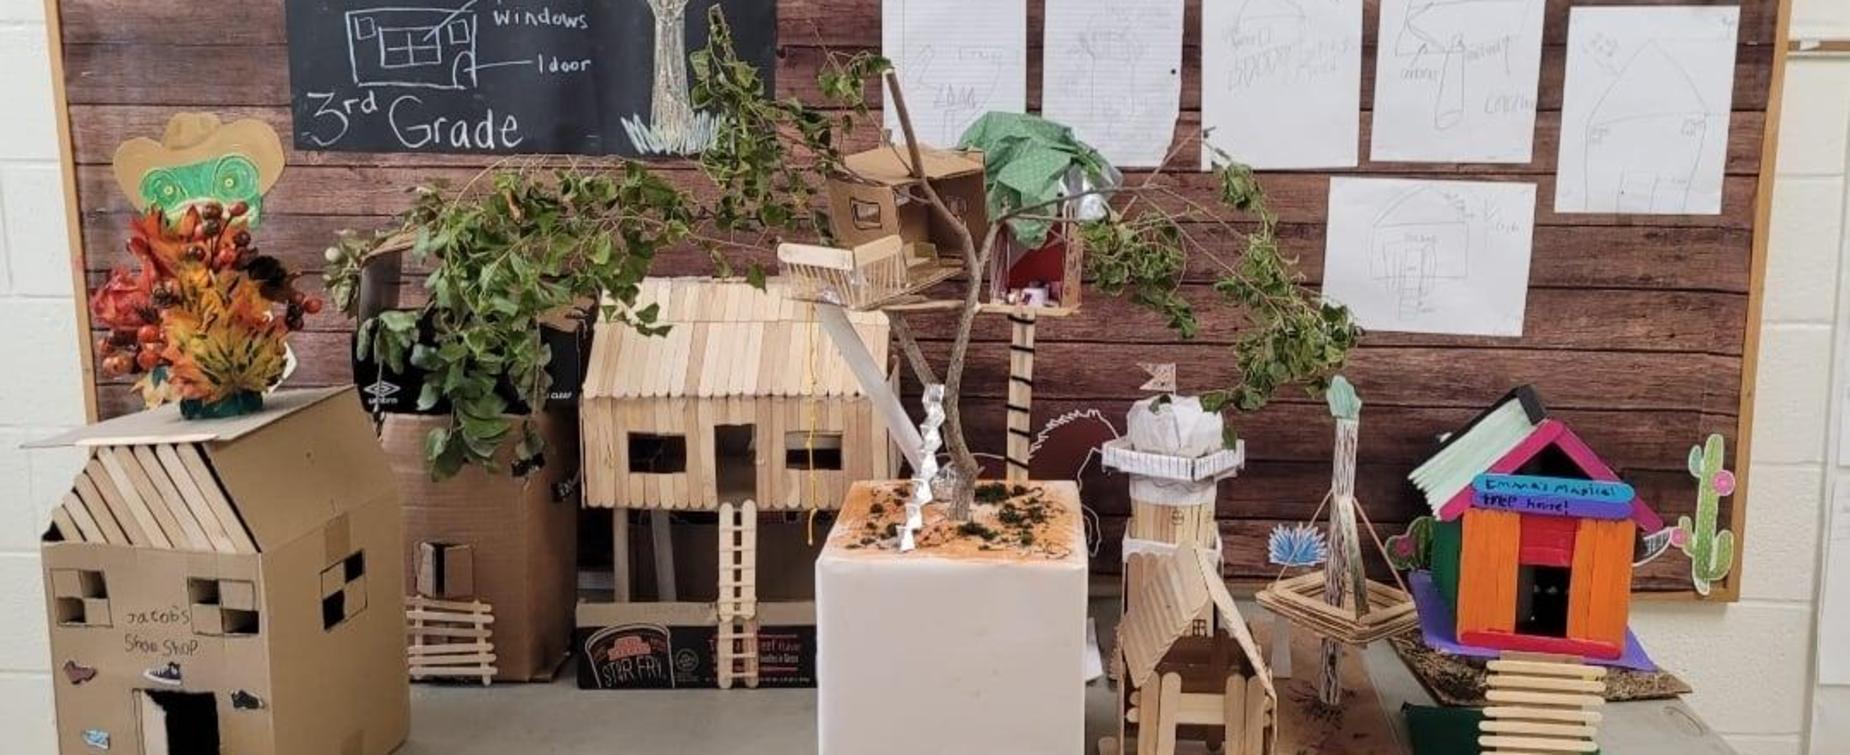 3rd Grade Tree house creations